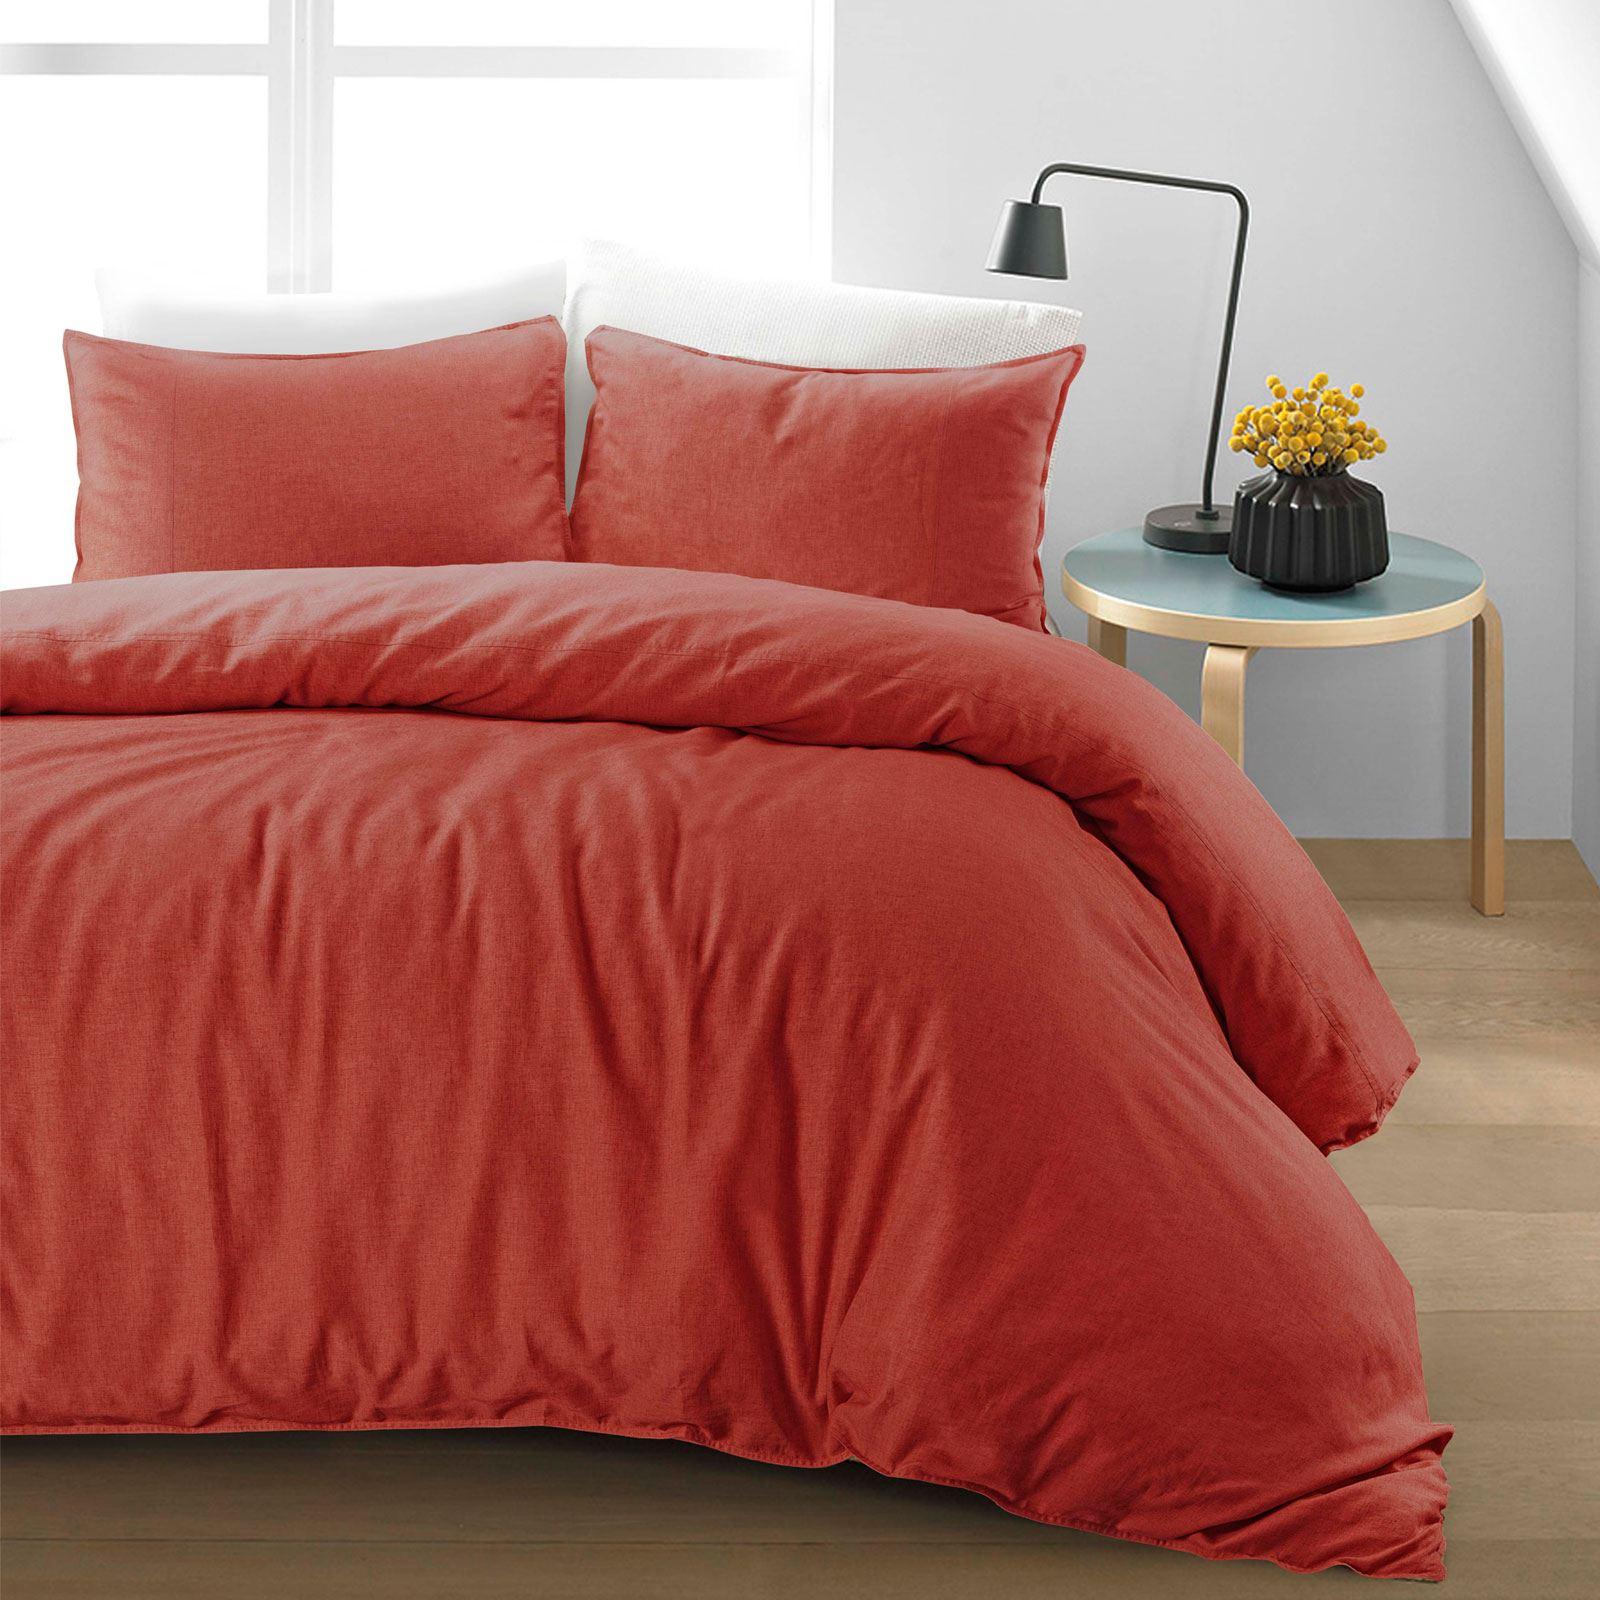 100-Cotton-Linen-Pure-Natural-Duvet-Cover-Bedding-Set-Double-King-Single thumbnail 29